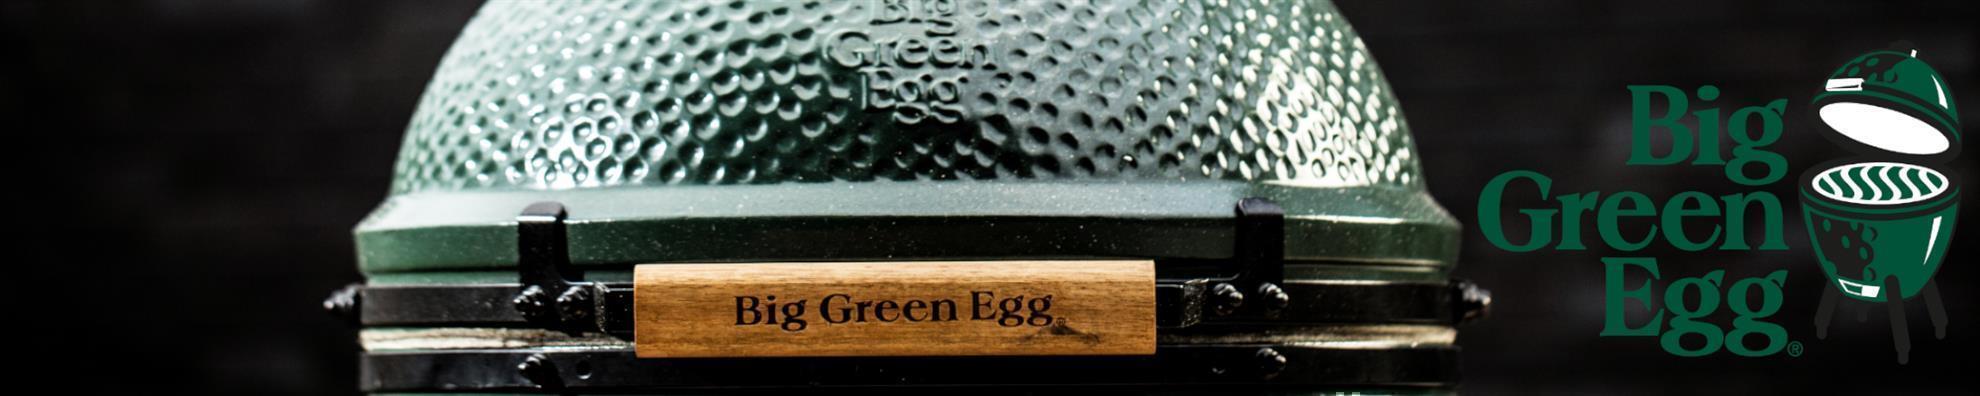 Big Green Egg - Starter-Set MiniMax inkl. Nest, convEGGtor, Holzkohle 4,5Kg, Grillanzünder, Ascheschieber